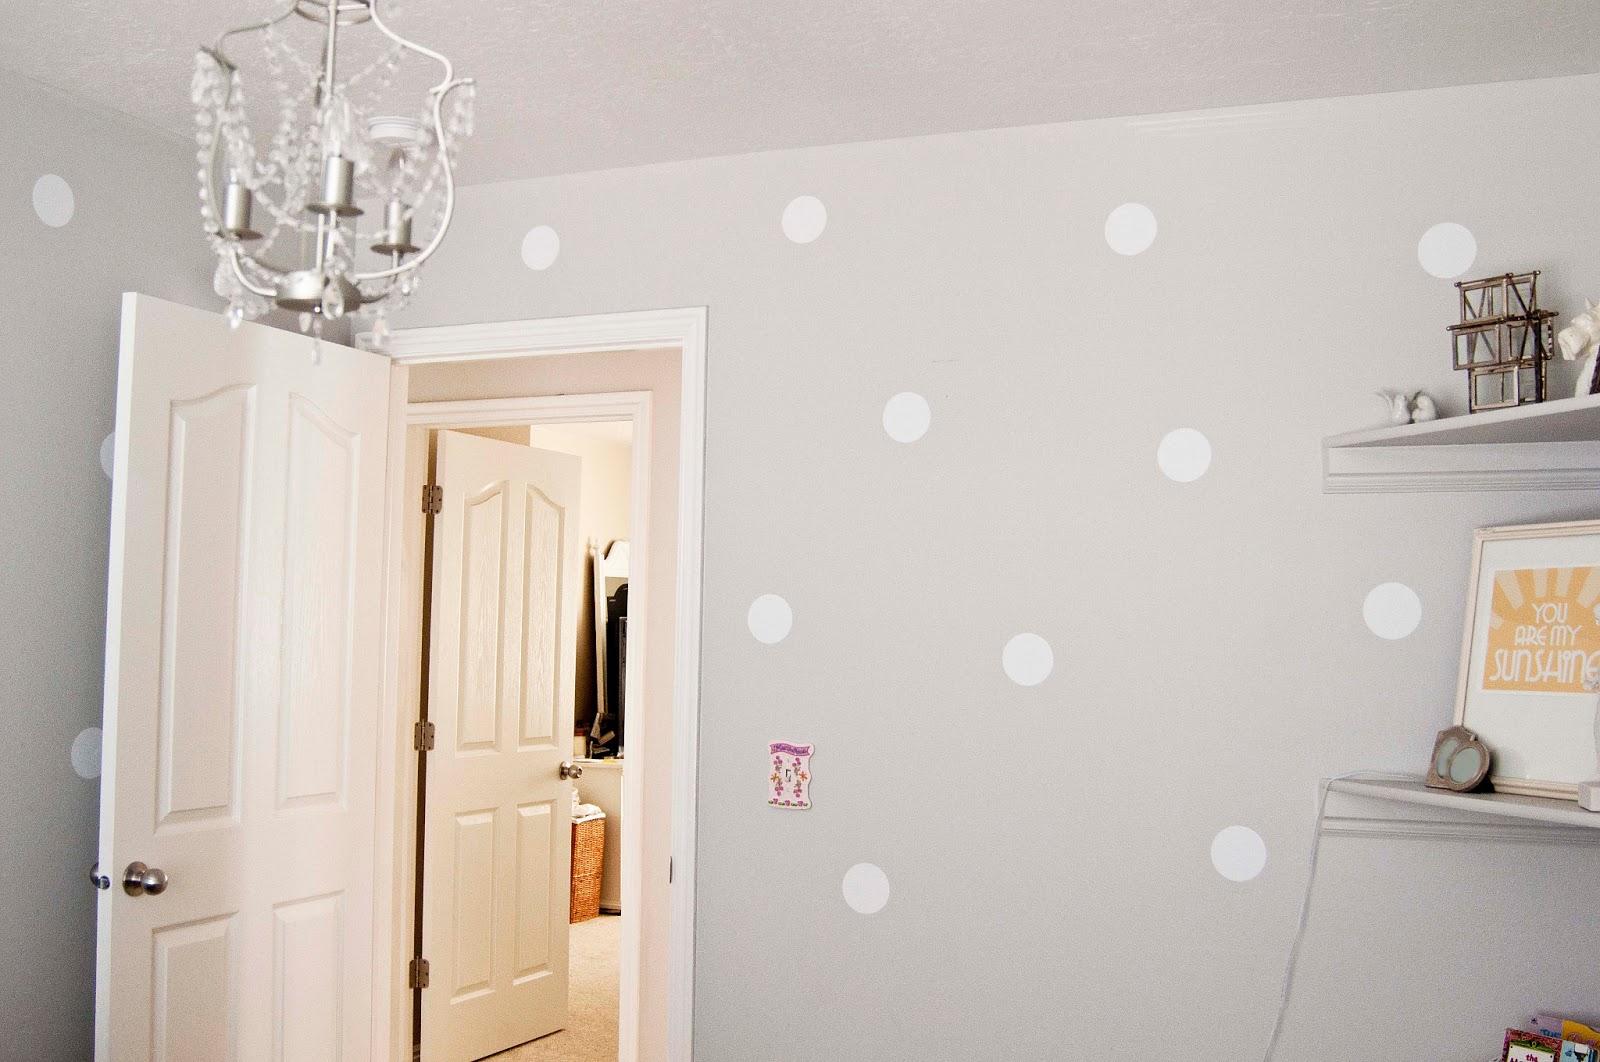 A Few of My Favorite Things: Polka-Dot Walls